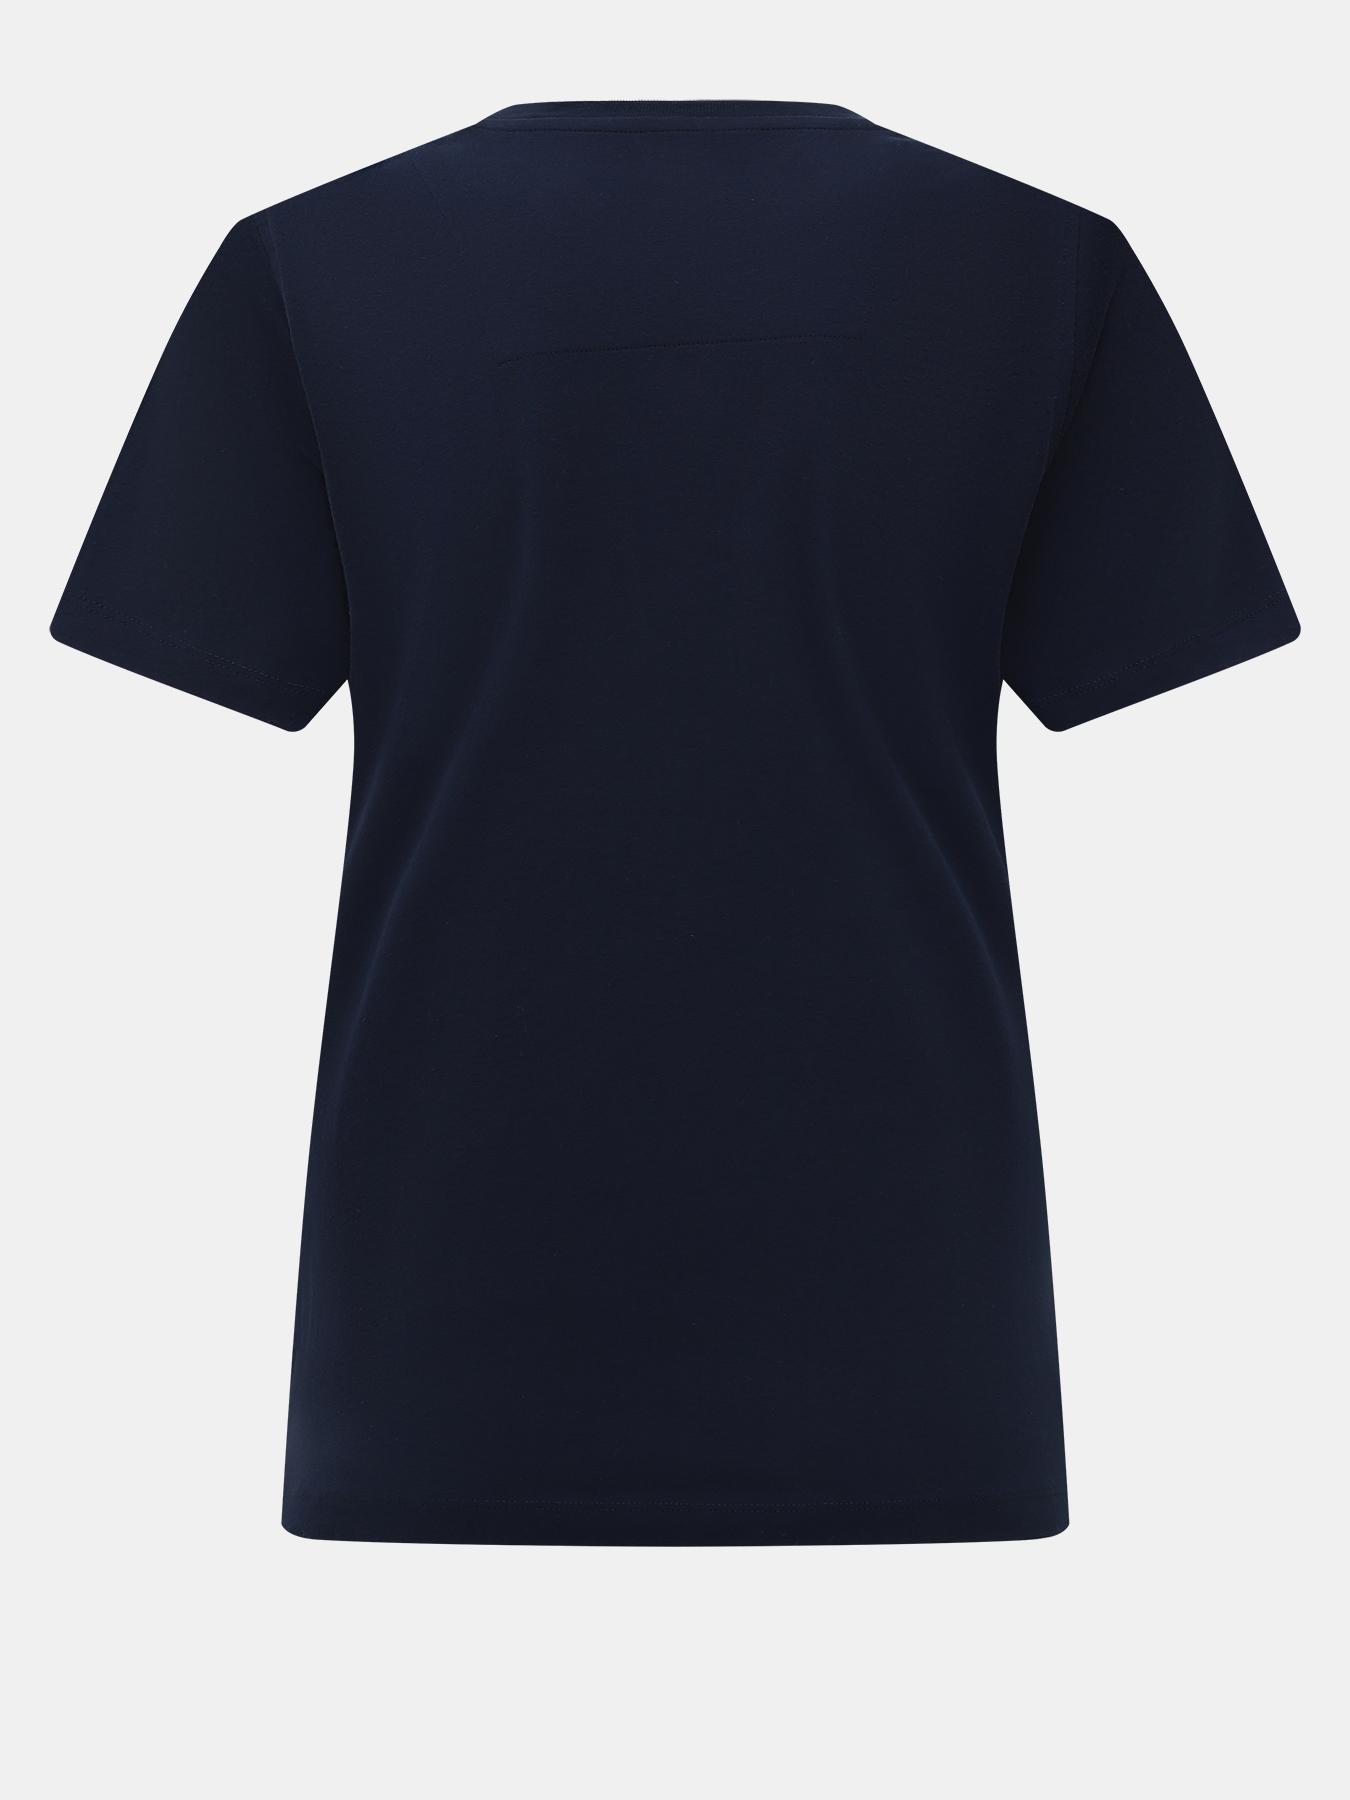 Фуфайка (футболка) Aeronautica Militare Футболка перчатки aeronautica militare aeronautica militare ae003dmfktw4